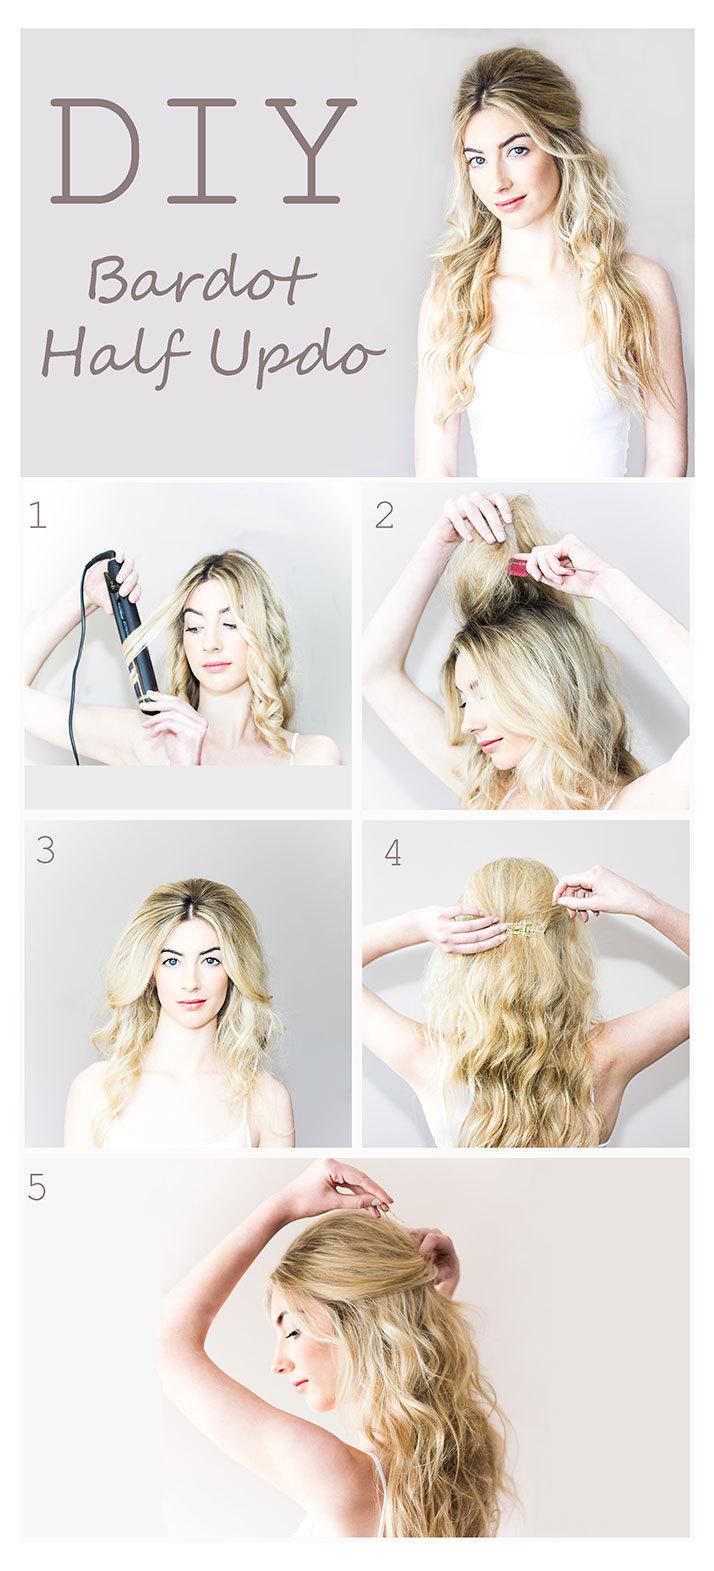 DIY Wedding Hair - Bardot Half Updo - TV3 Xposé